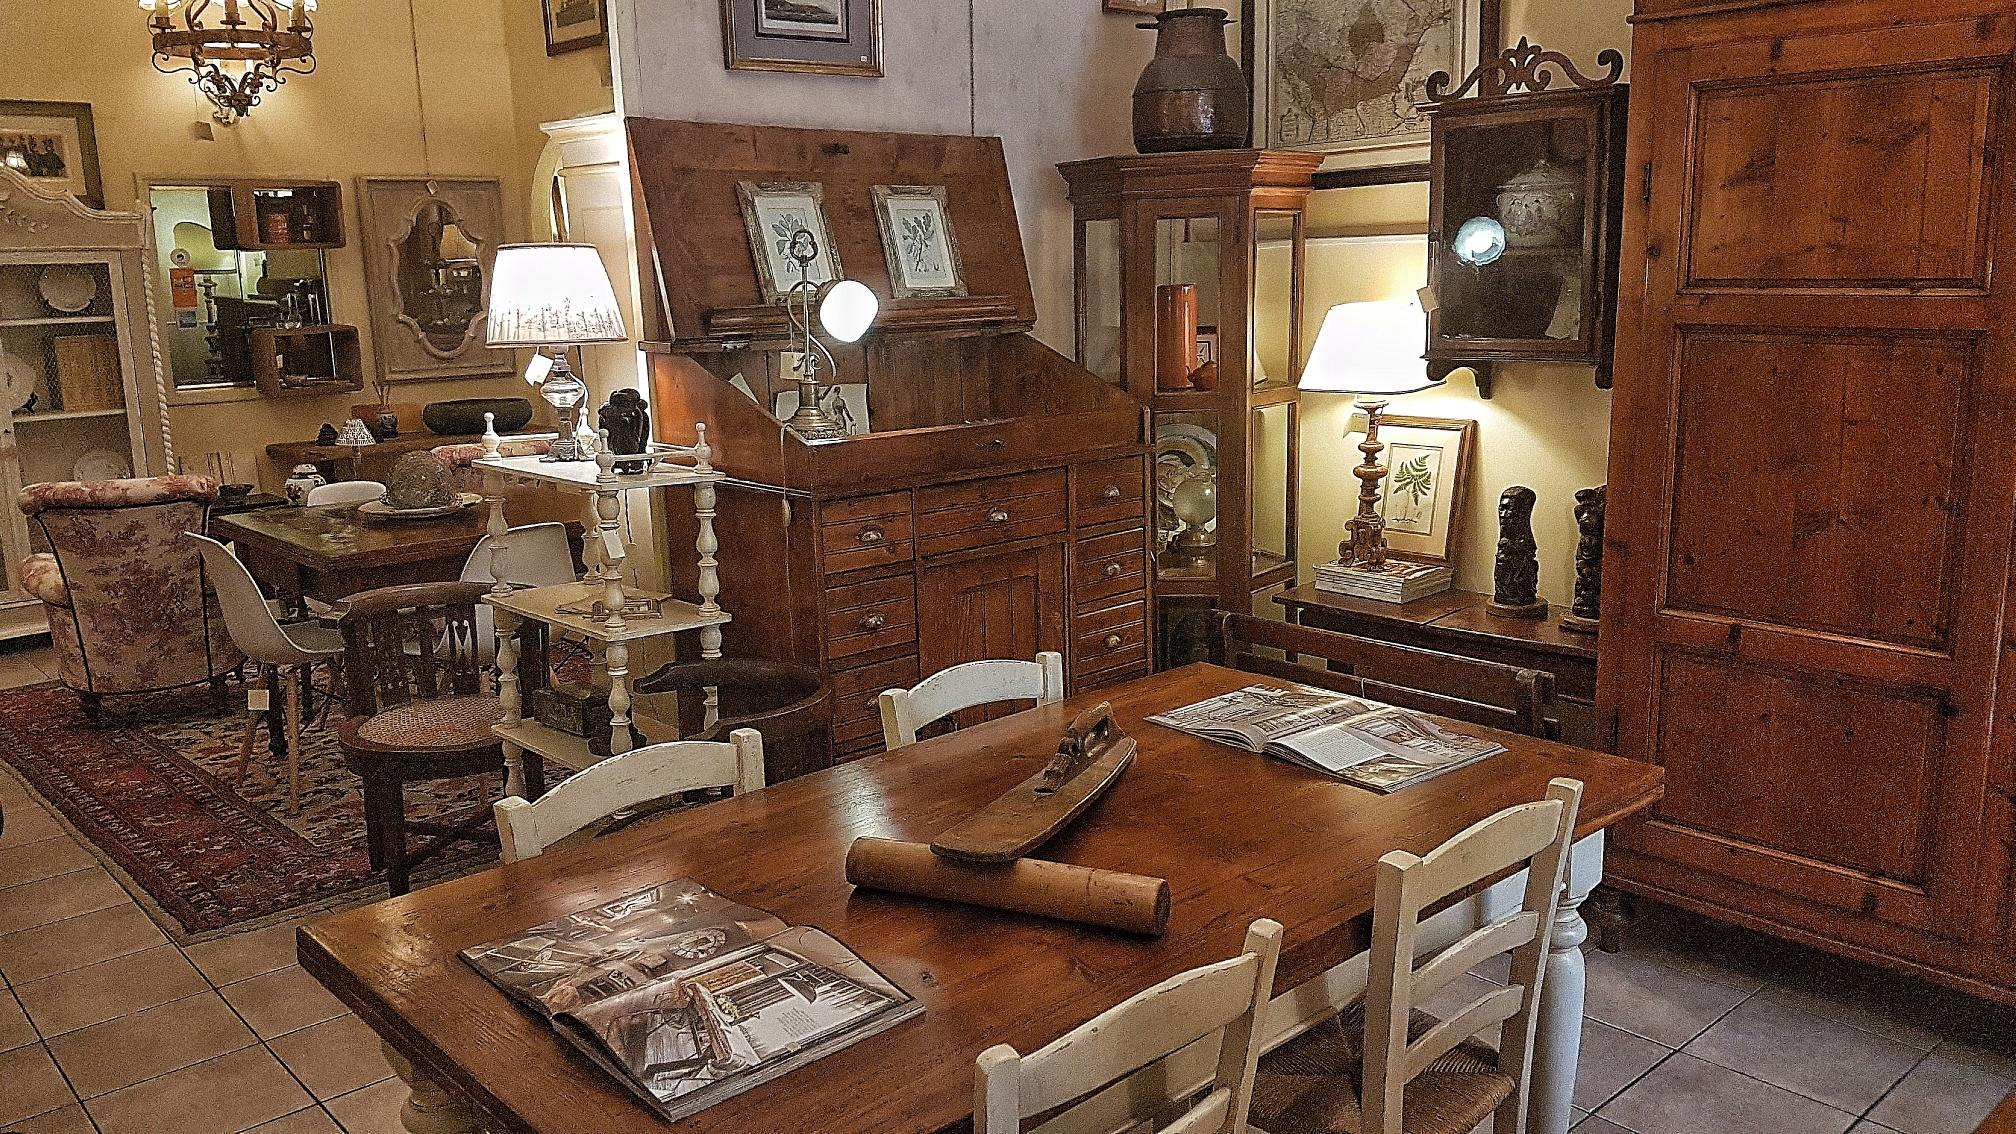 Arredamento mobili country su misura siena u firenze with mobili stile toscano - Cucine stile toscano ...